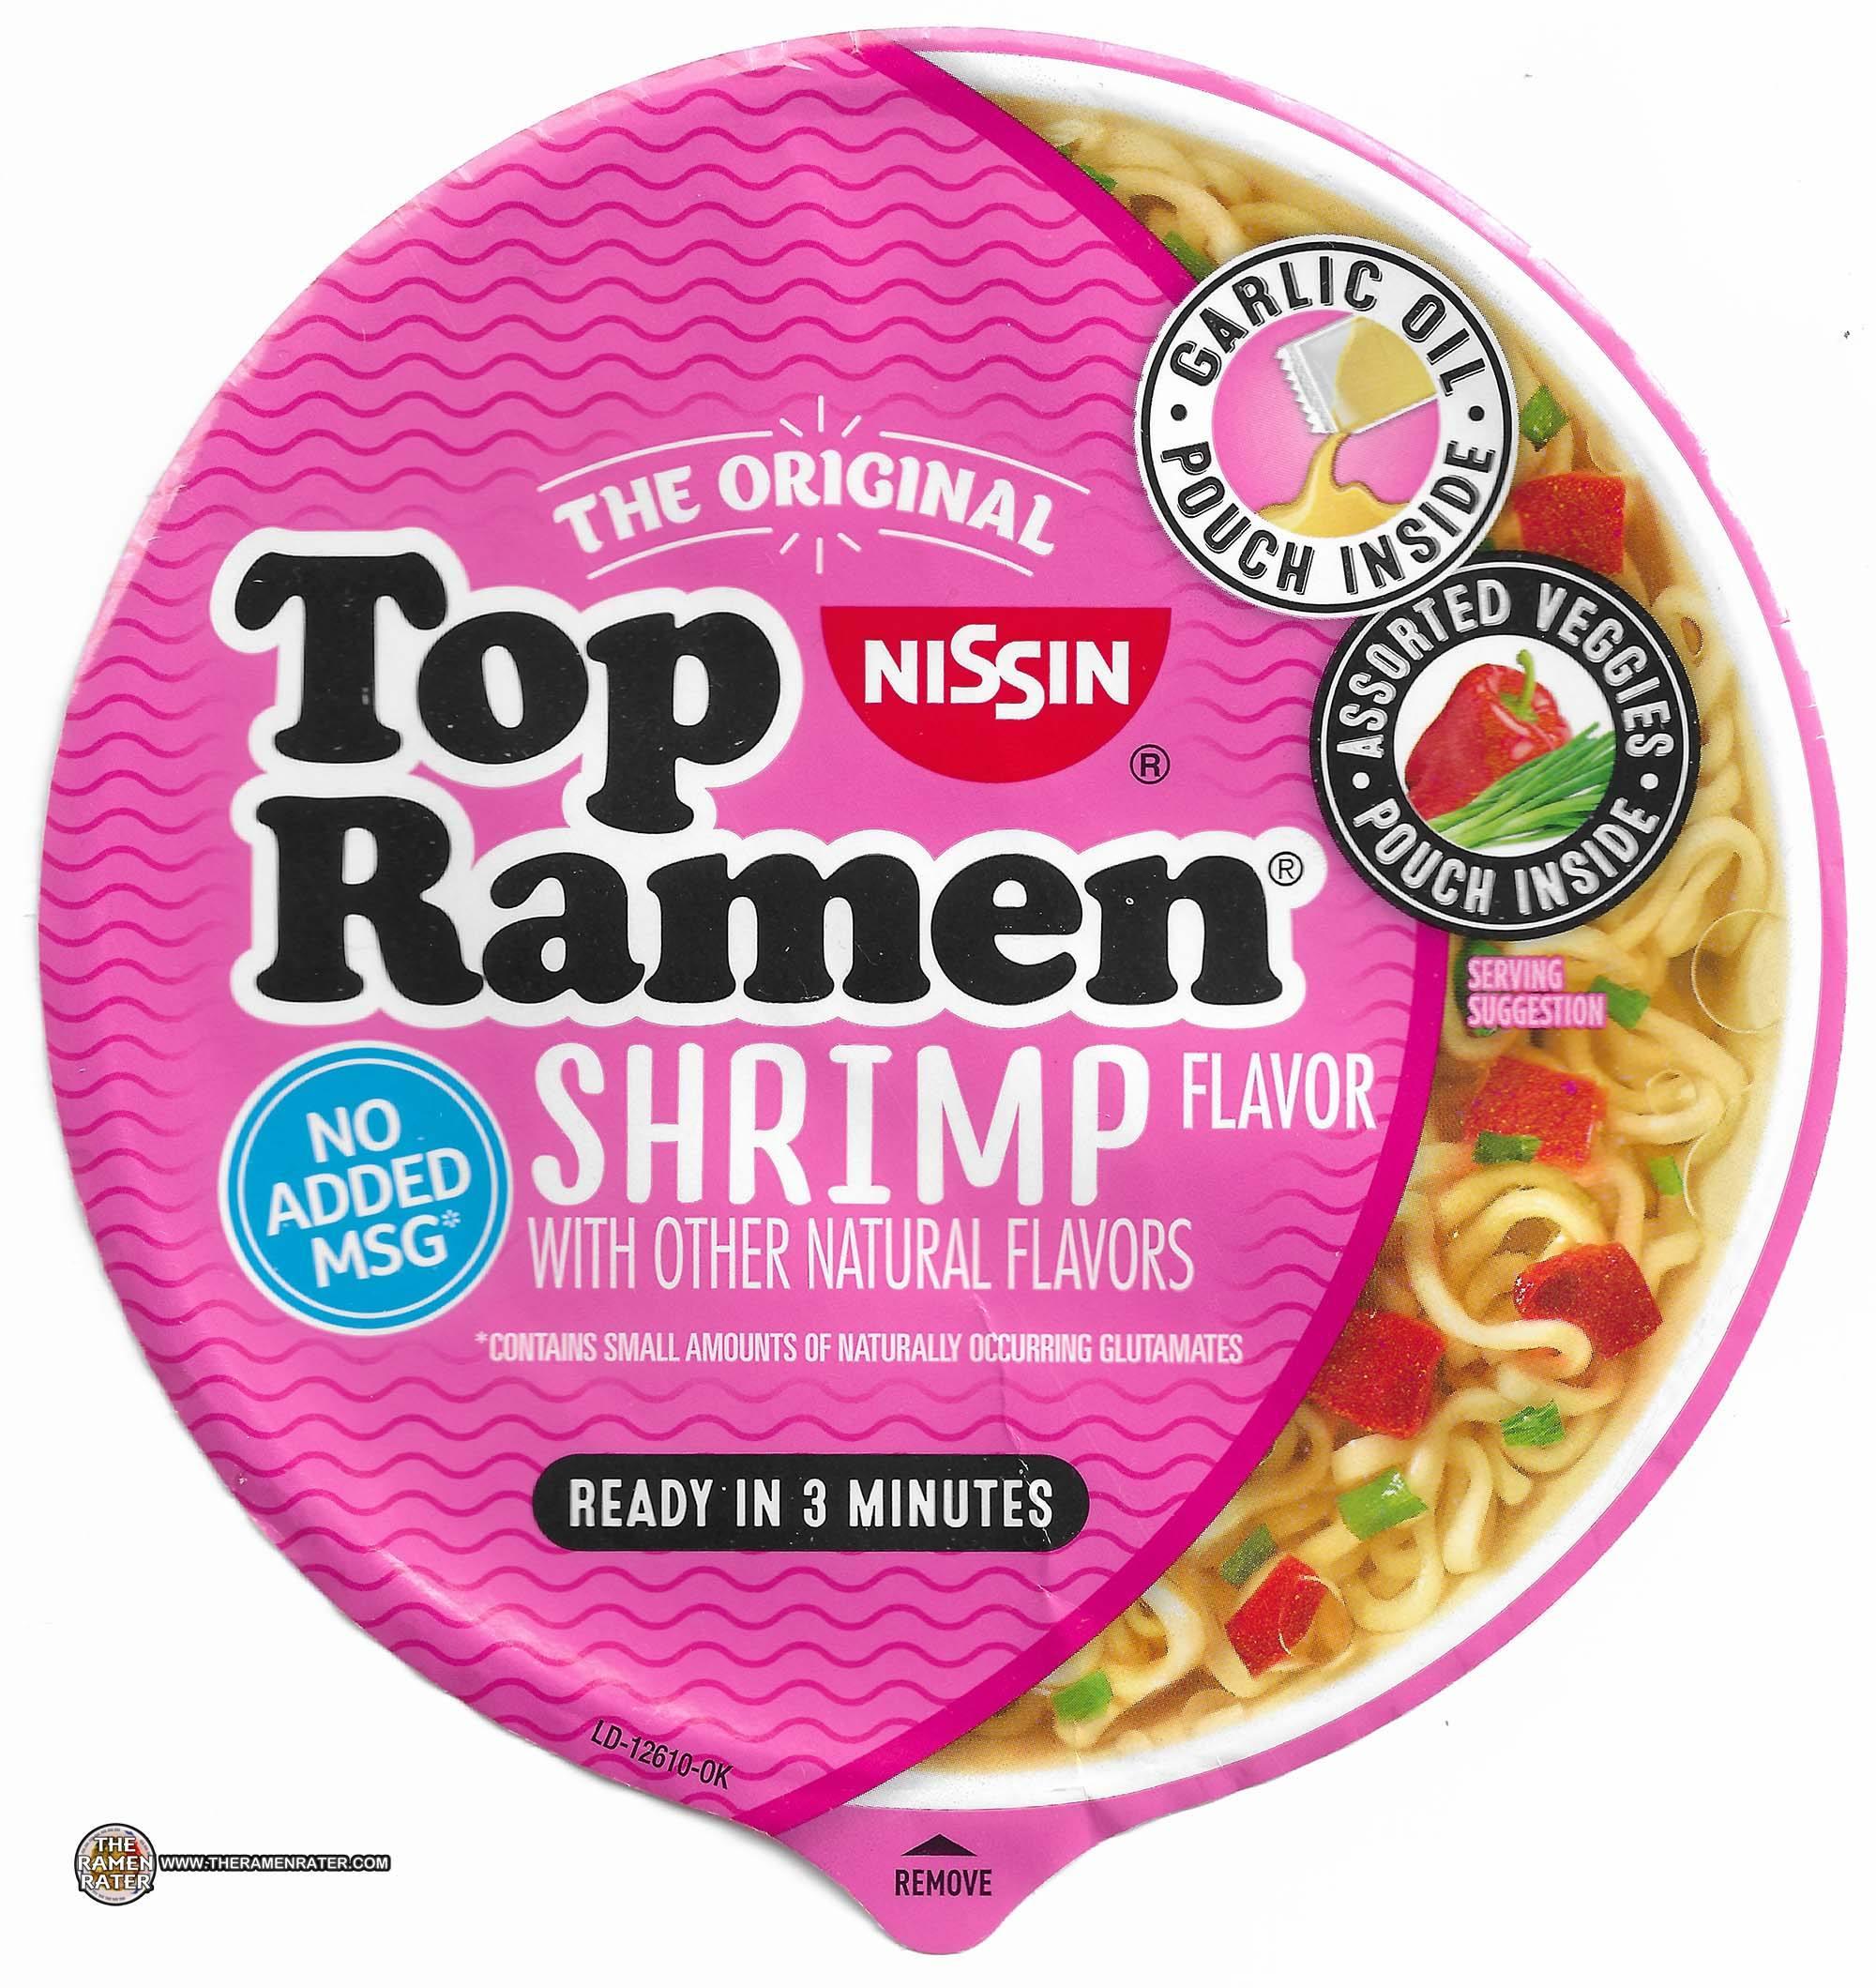 3358 Nissin Top Ramen Shrimp Flavor Bowl United States